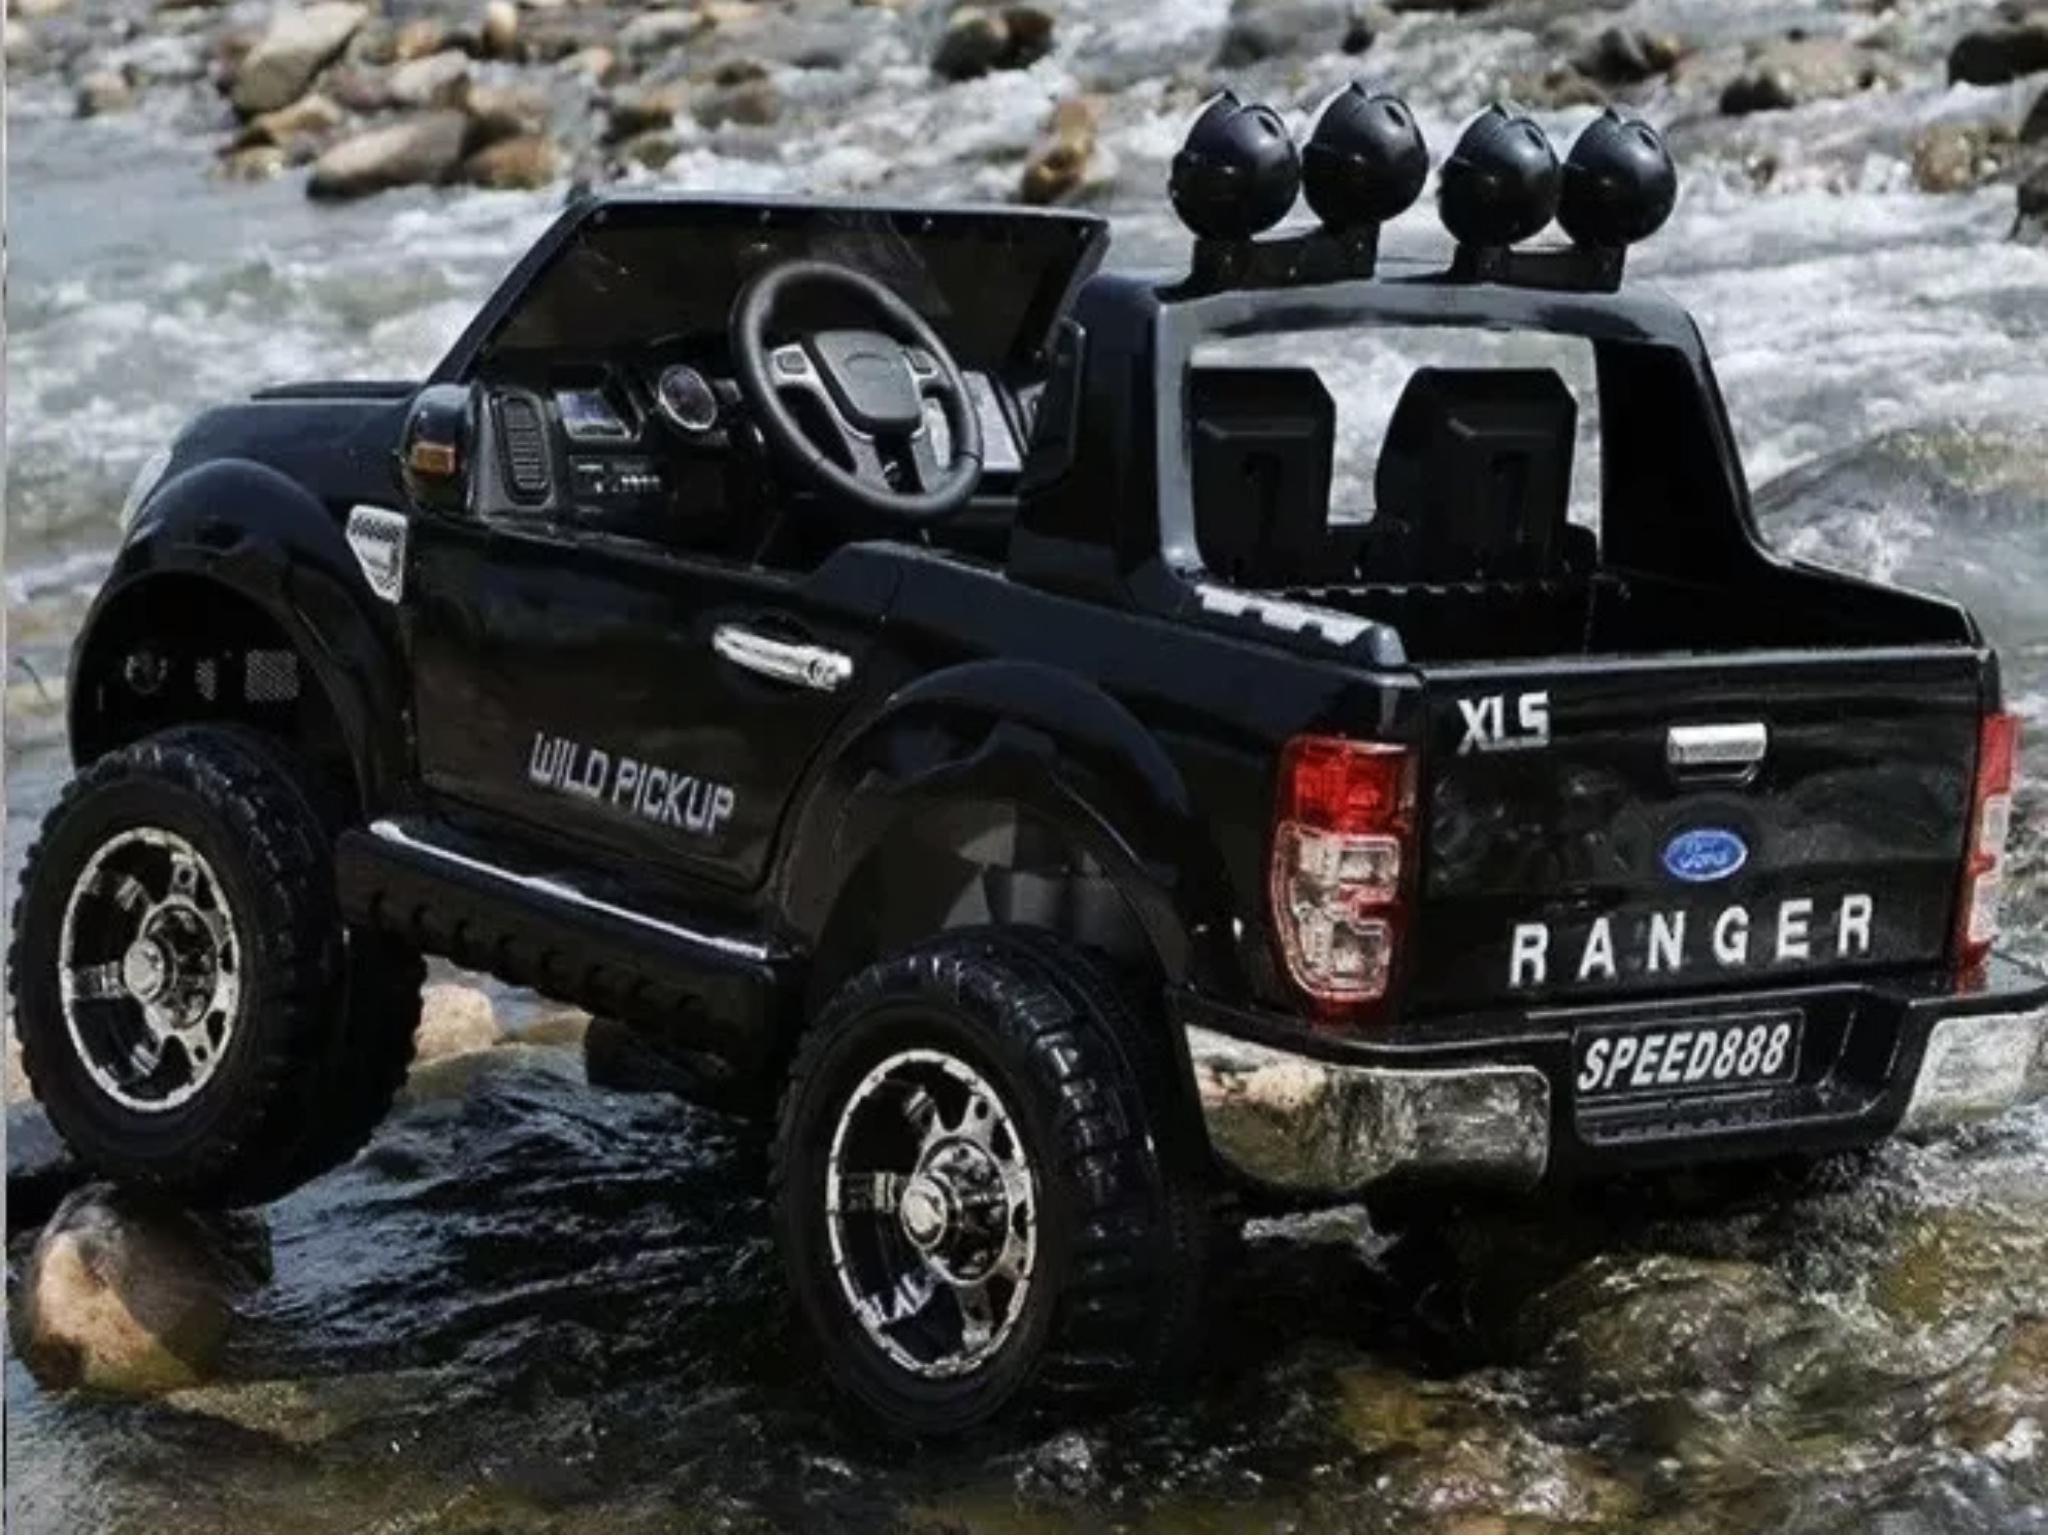 Licensed Ford Ranger Mini Electric Car 12v Black Pre-Order / Layby